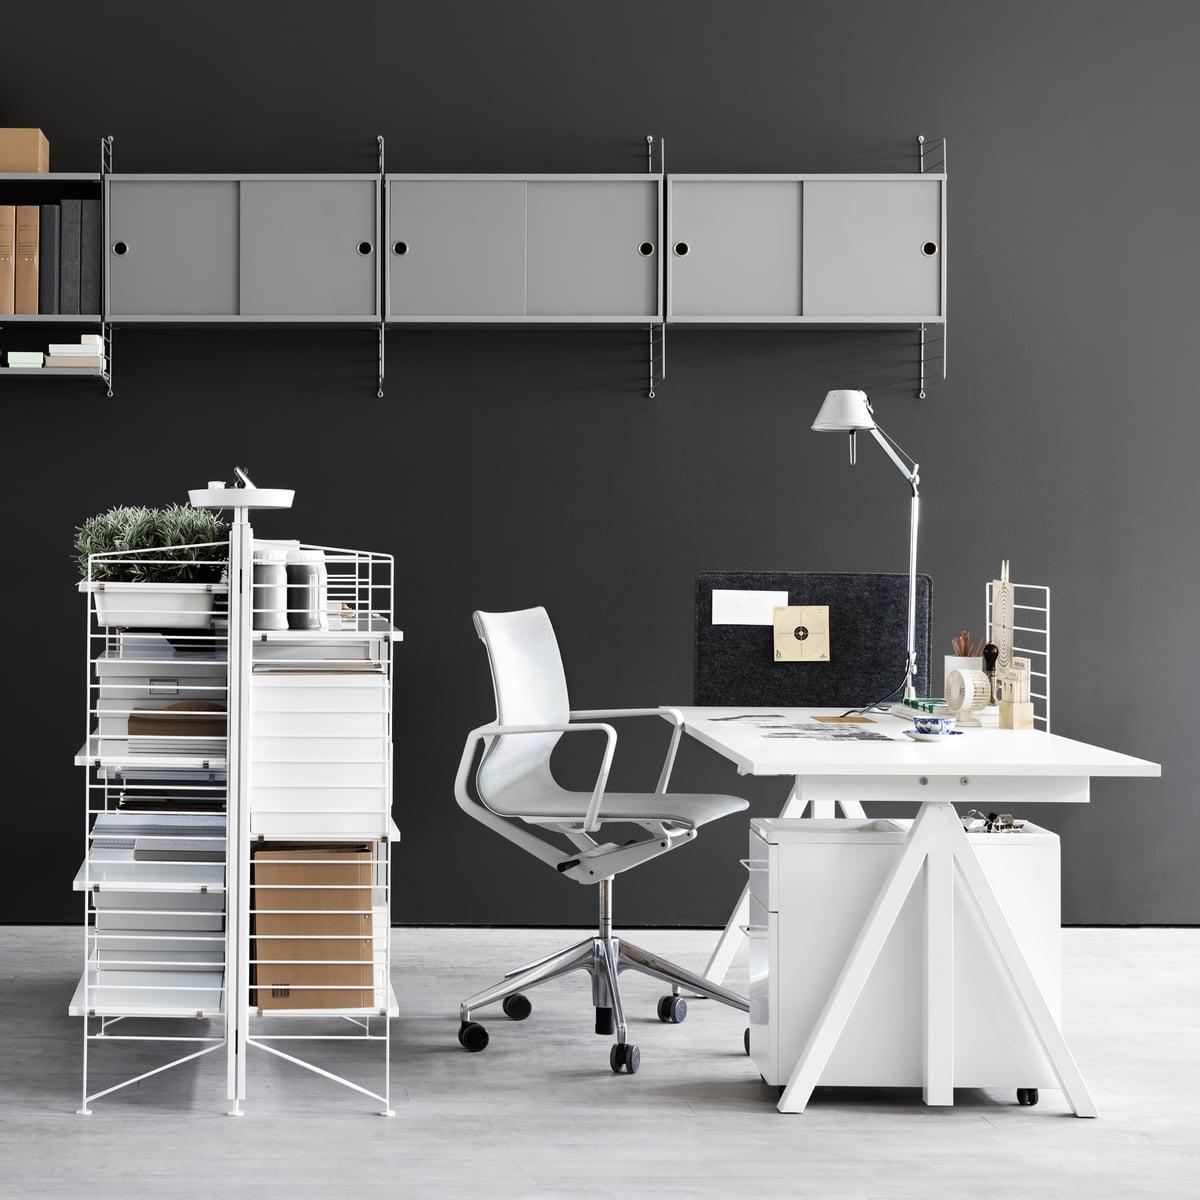 works freistehendes regal von string. Black Bedroom Furniture Sets. Home Design Ideas